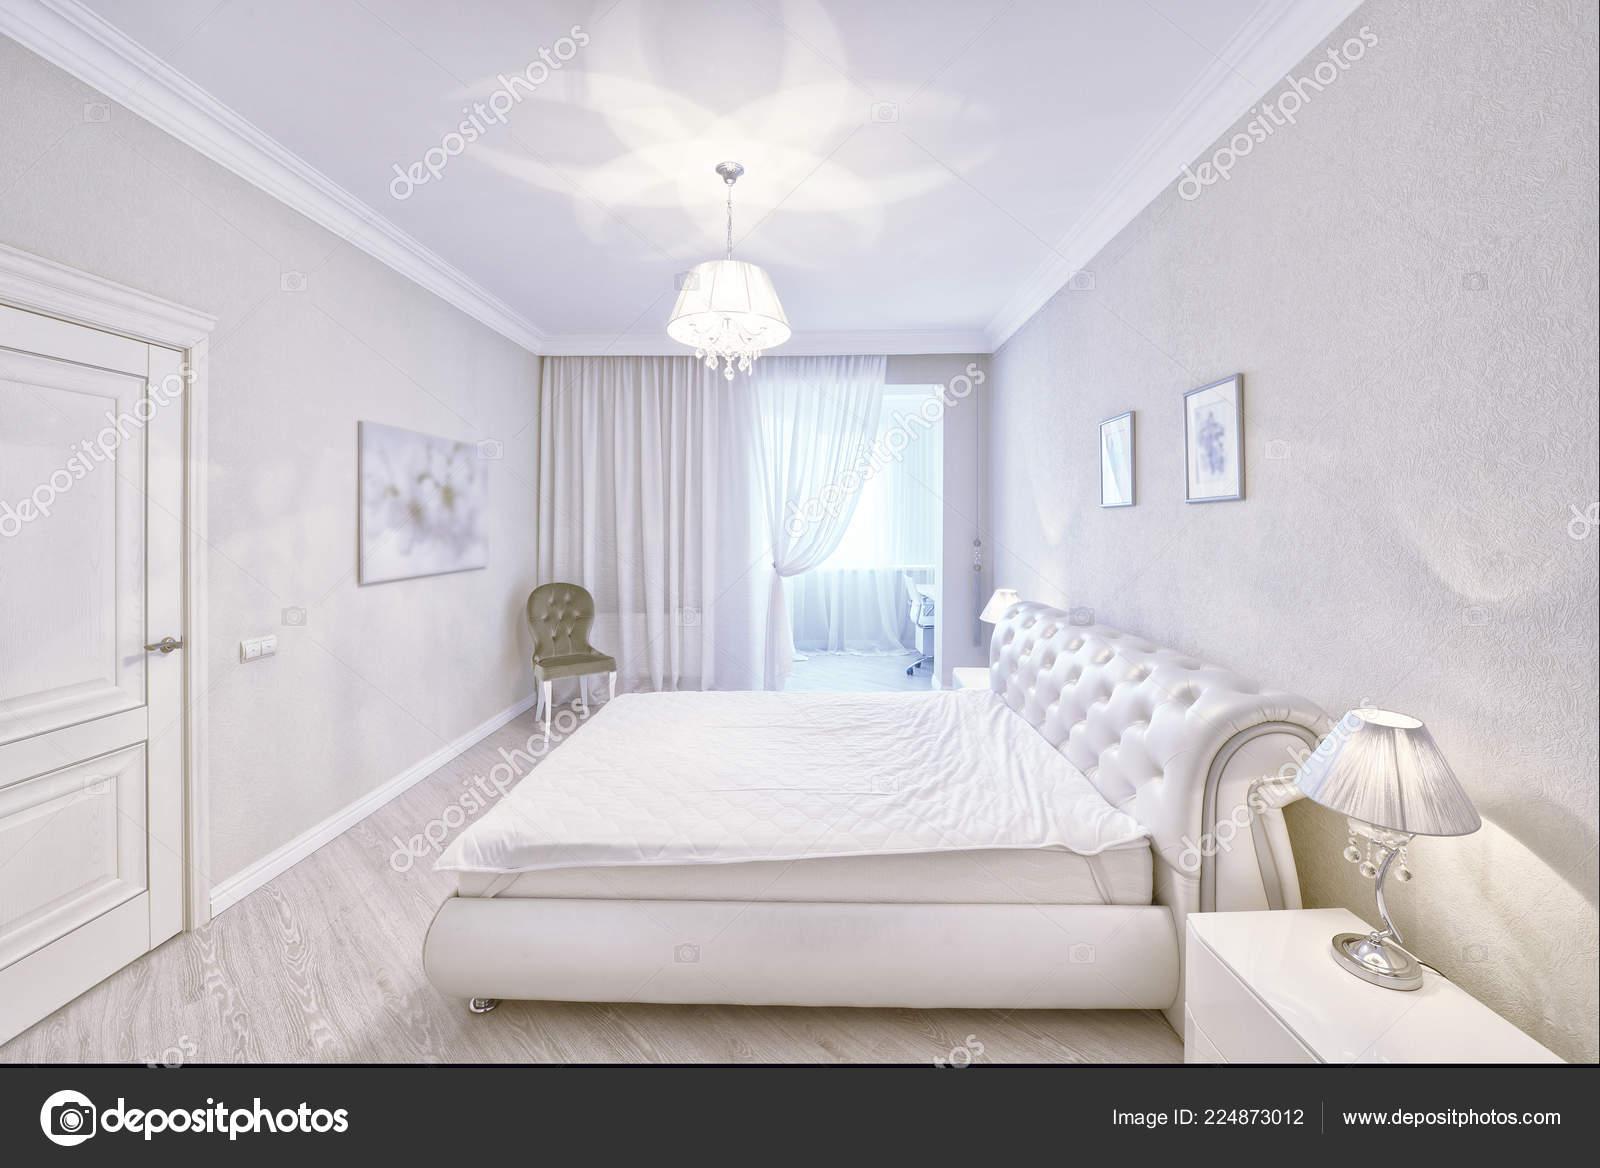 Bedroom Interior White Color Modern House Stock Photo C Ovchinnikovfoto 224873012